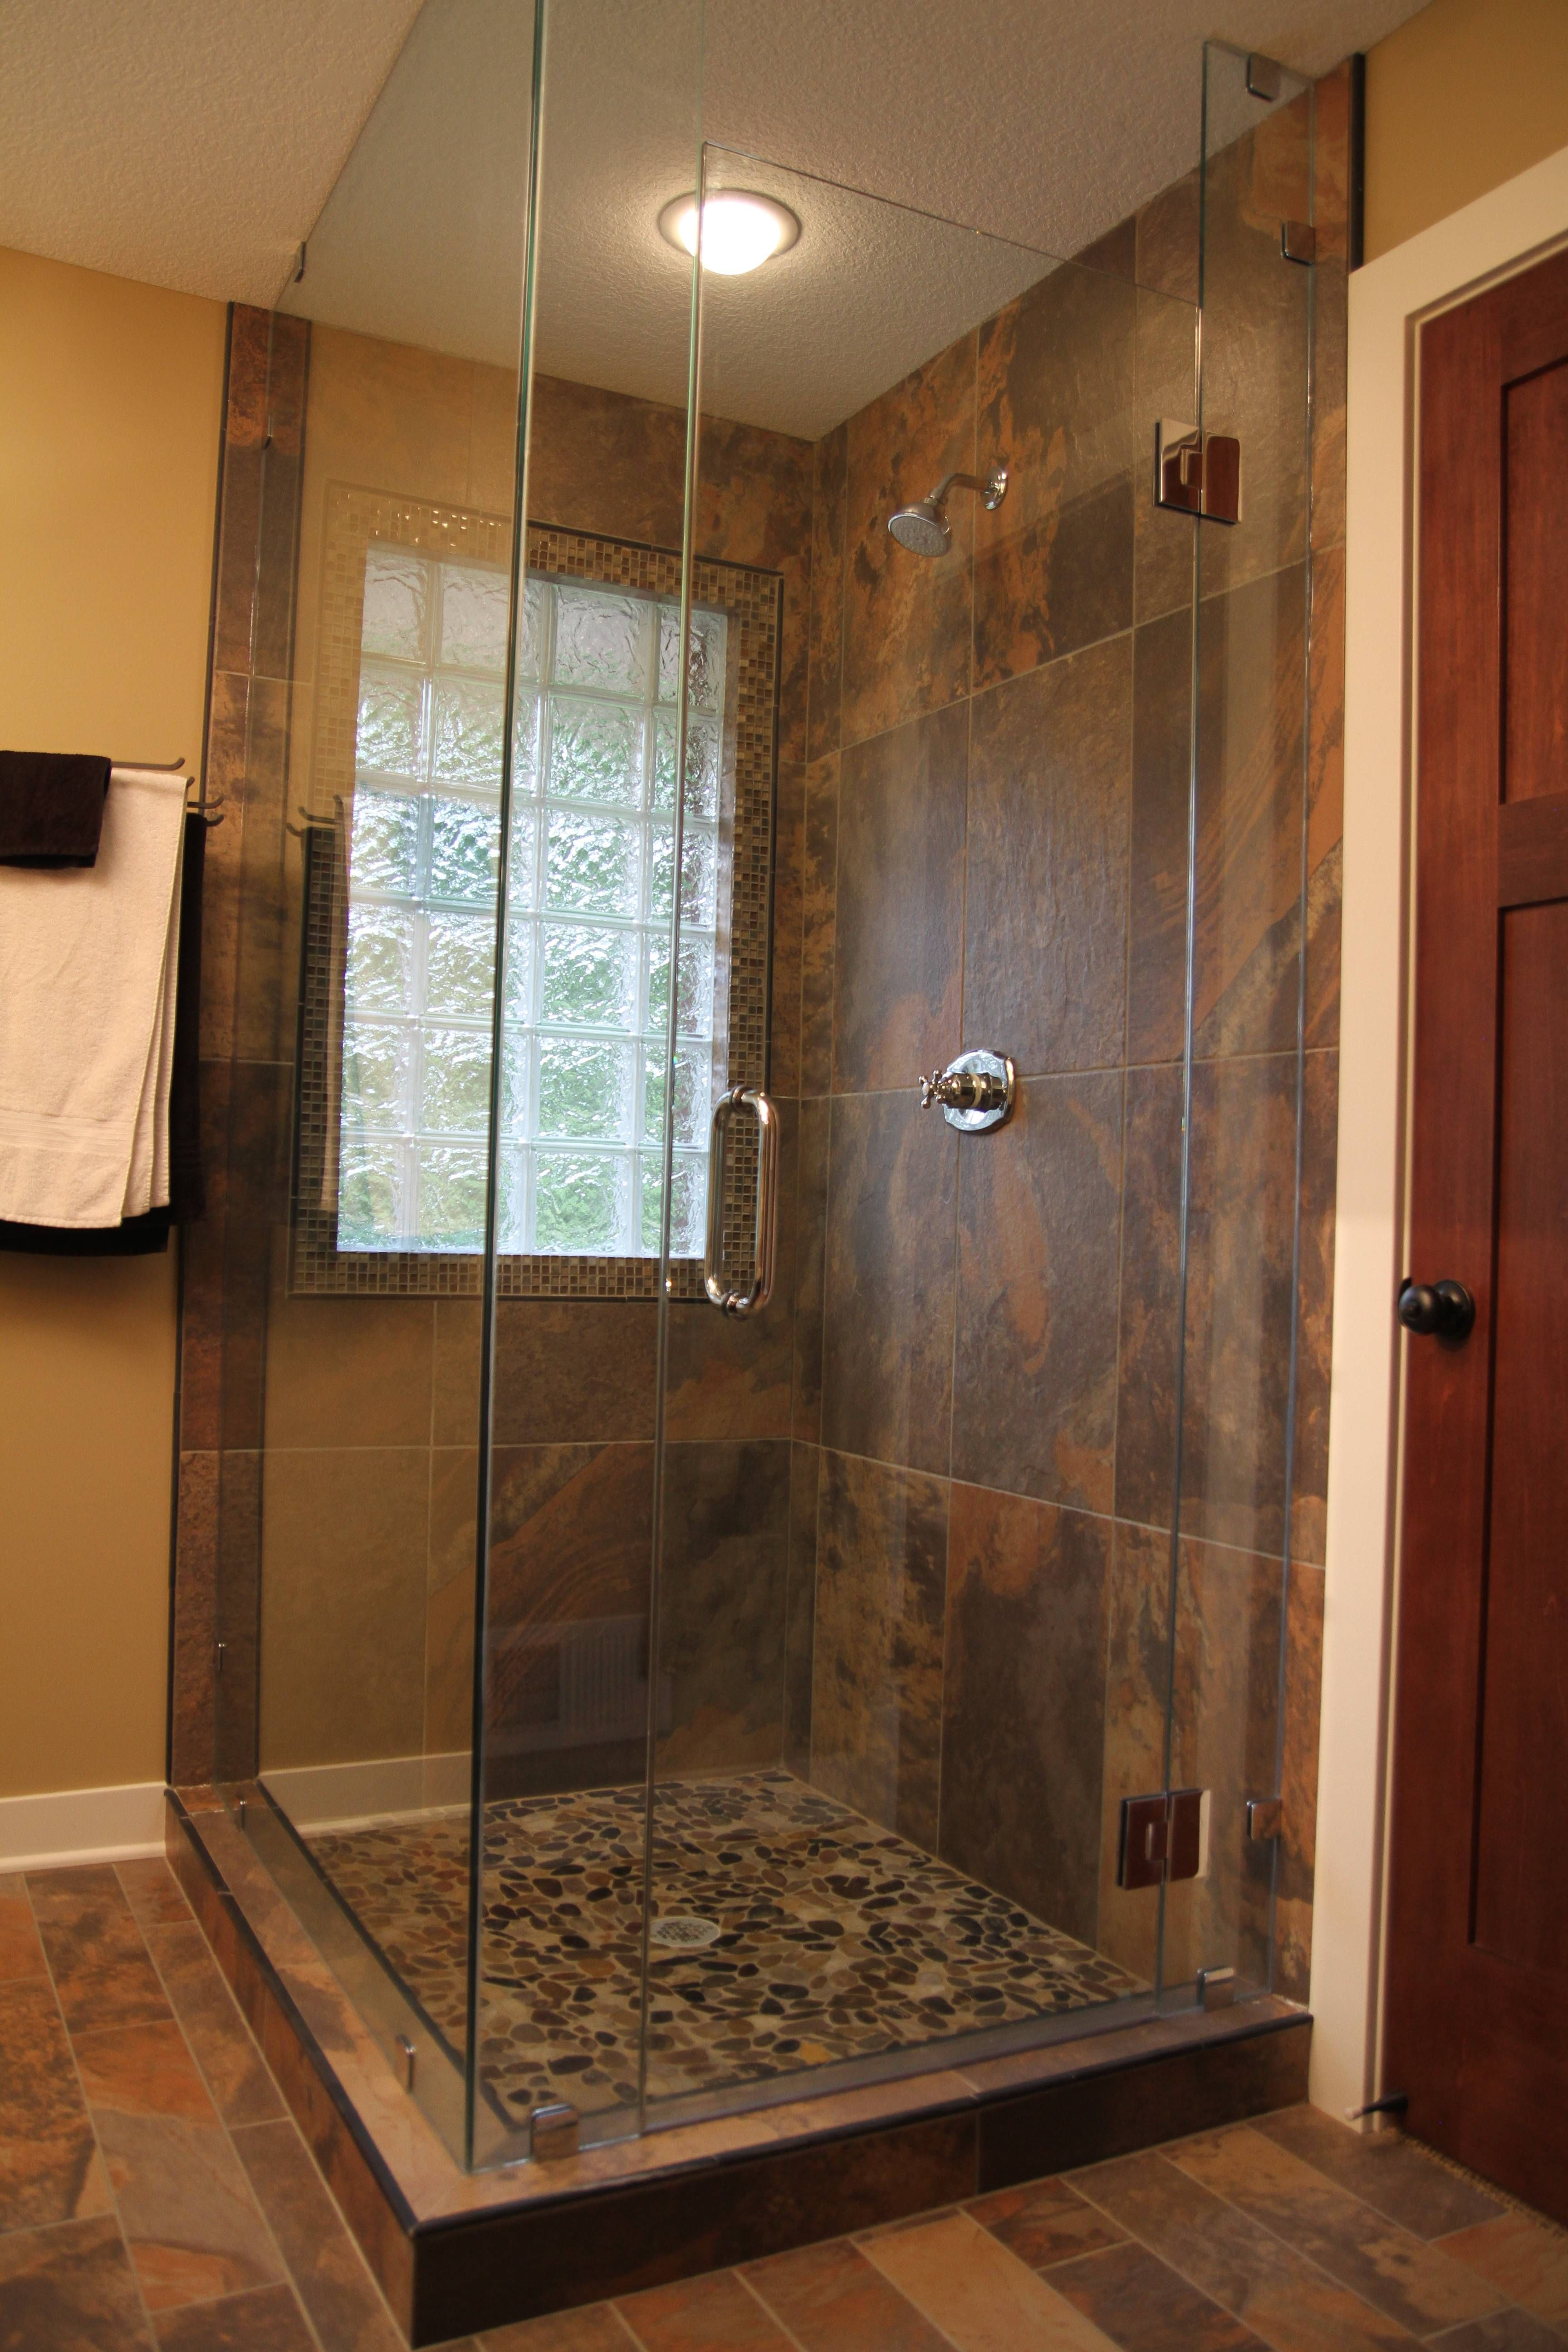 Custom shower 38 glass pebble tile floor porcelain tile with custom shower glass pebble tile floor porcelain tile with slate look glass block window doublecrazyfo Images